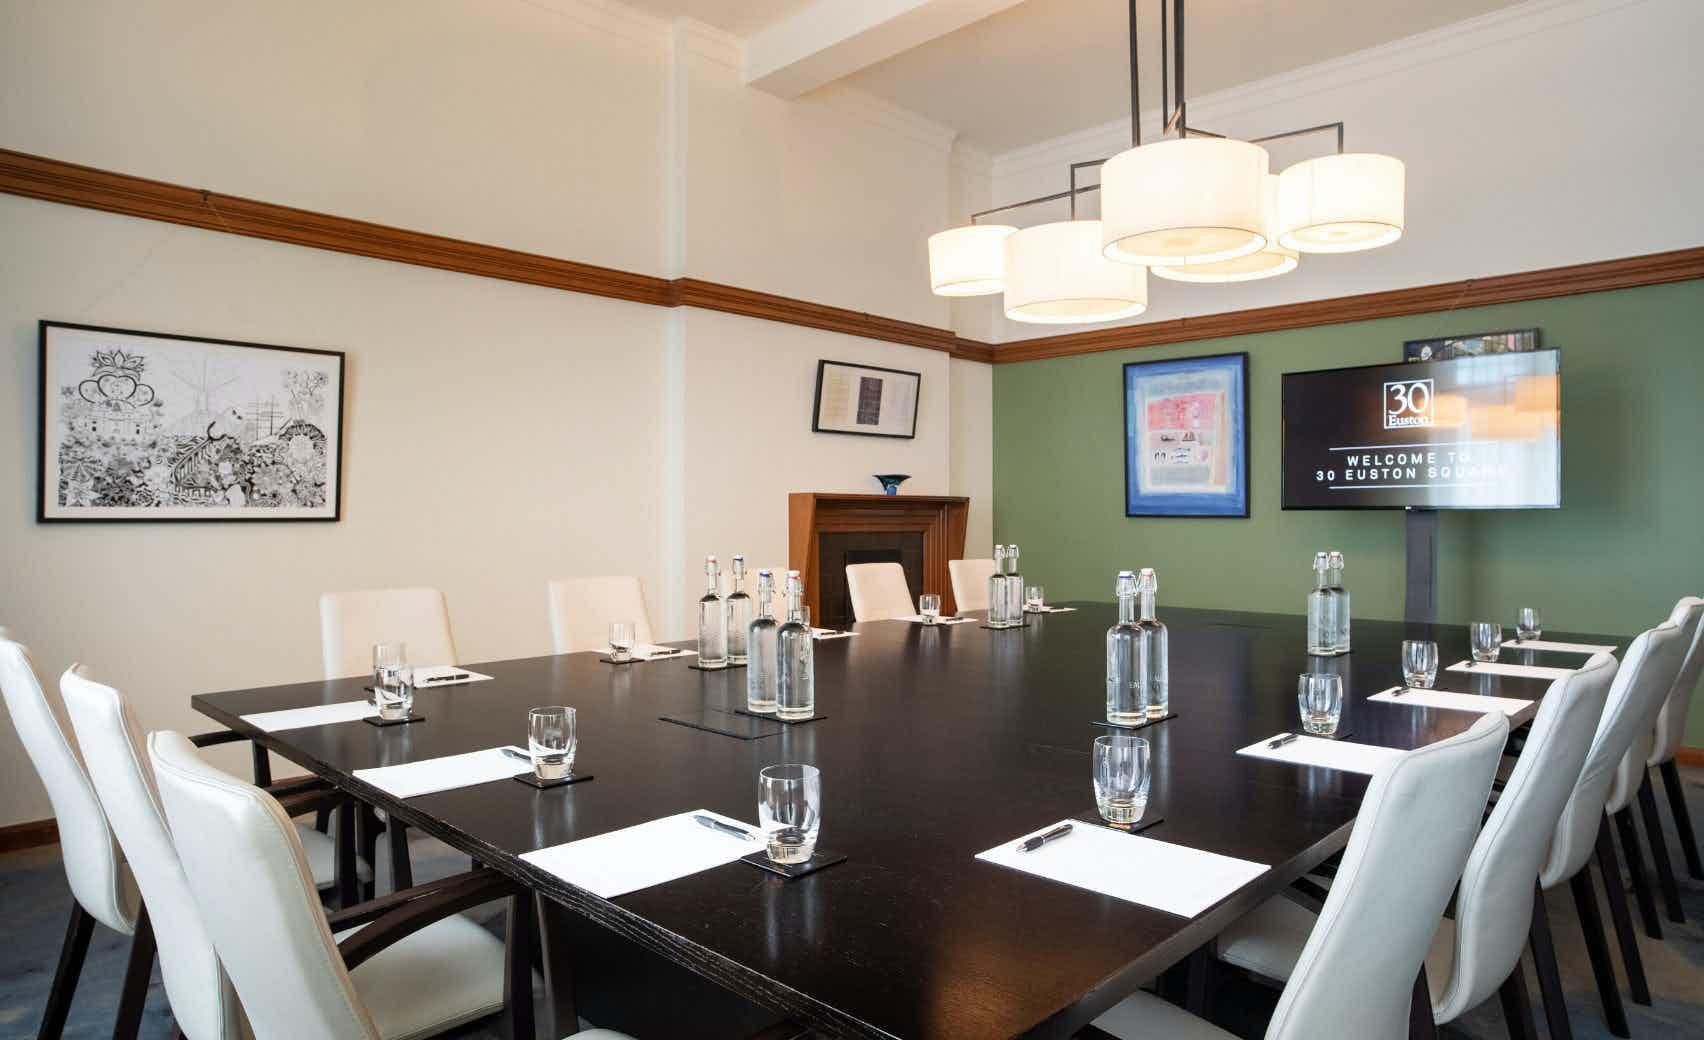 Scotland, Heritage Room, 30 Euston Square